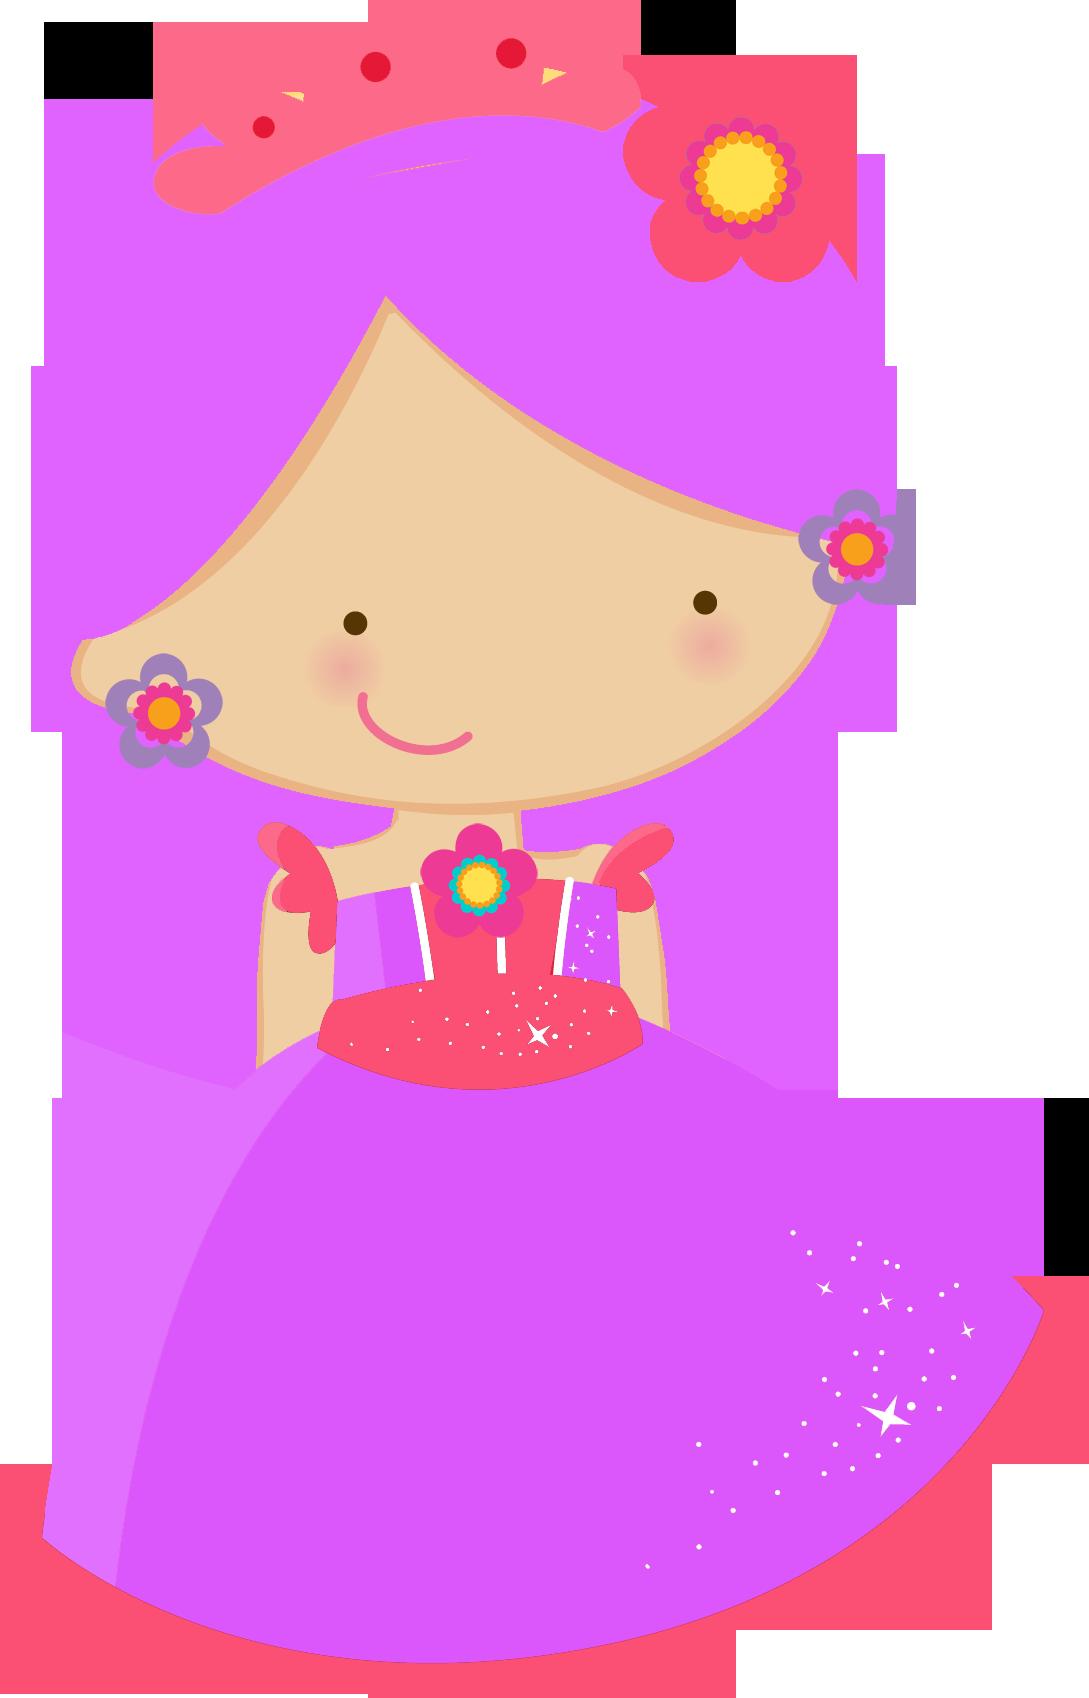 Meninas - ZWD_Princess copia 5.png - Minus